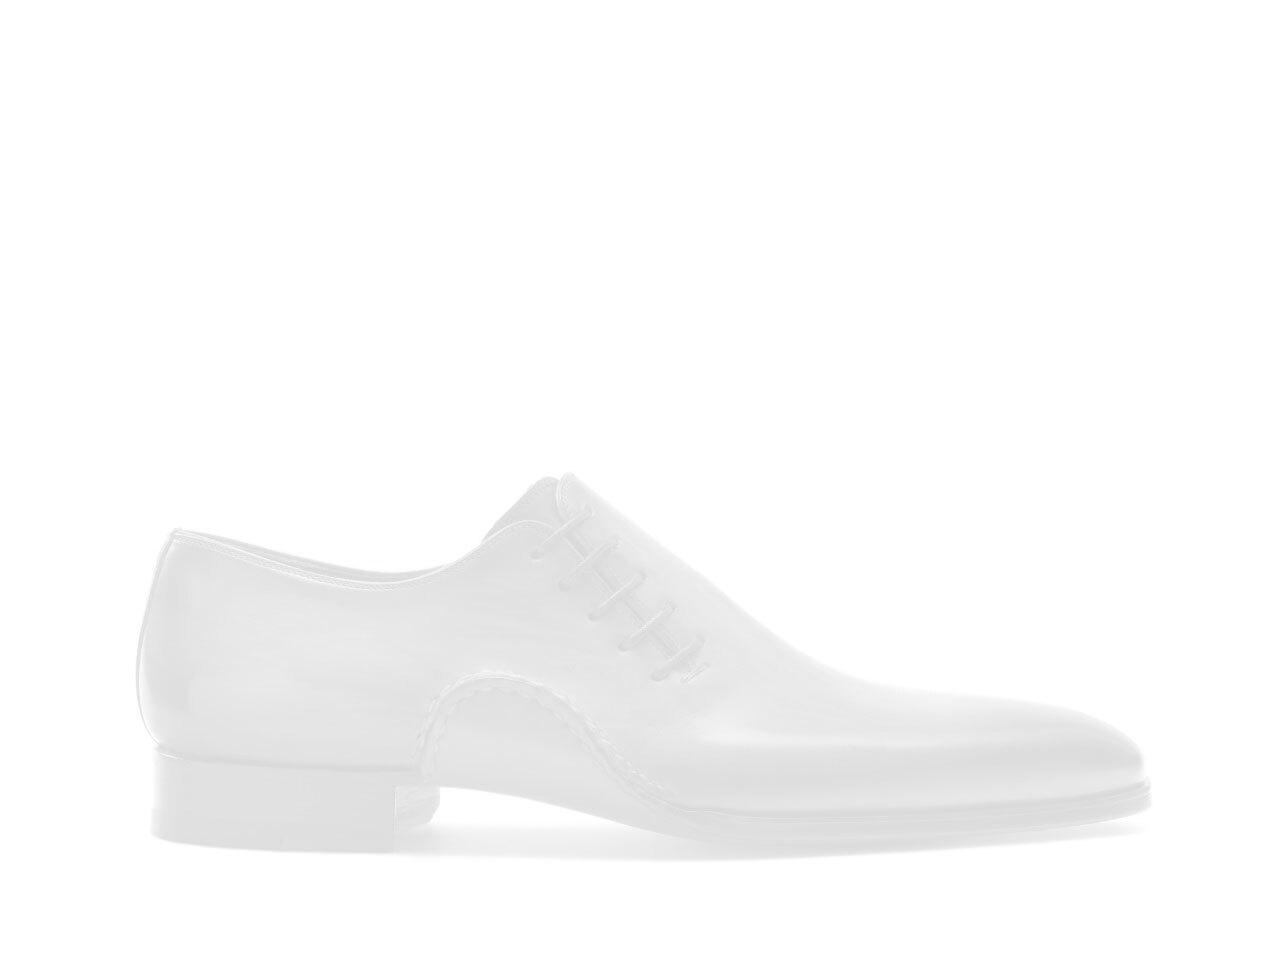 Pair of the Magnanni Armando Grey Men's Oxford Shoes